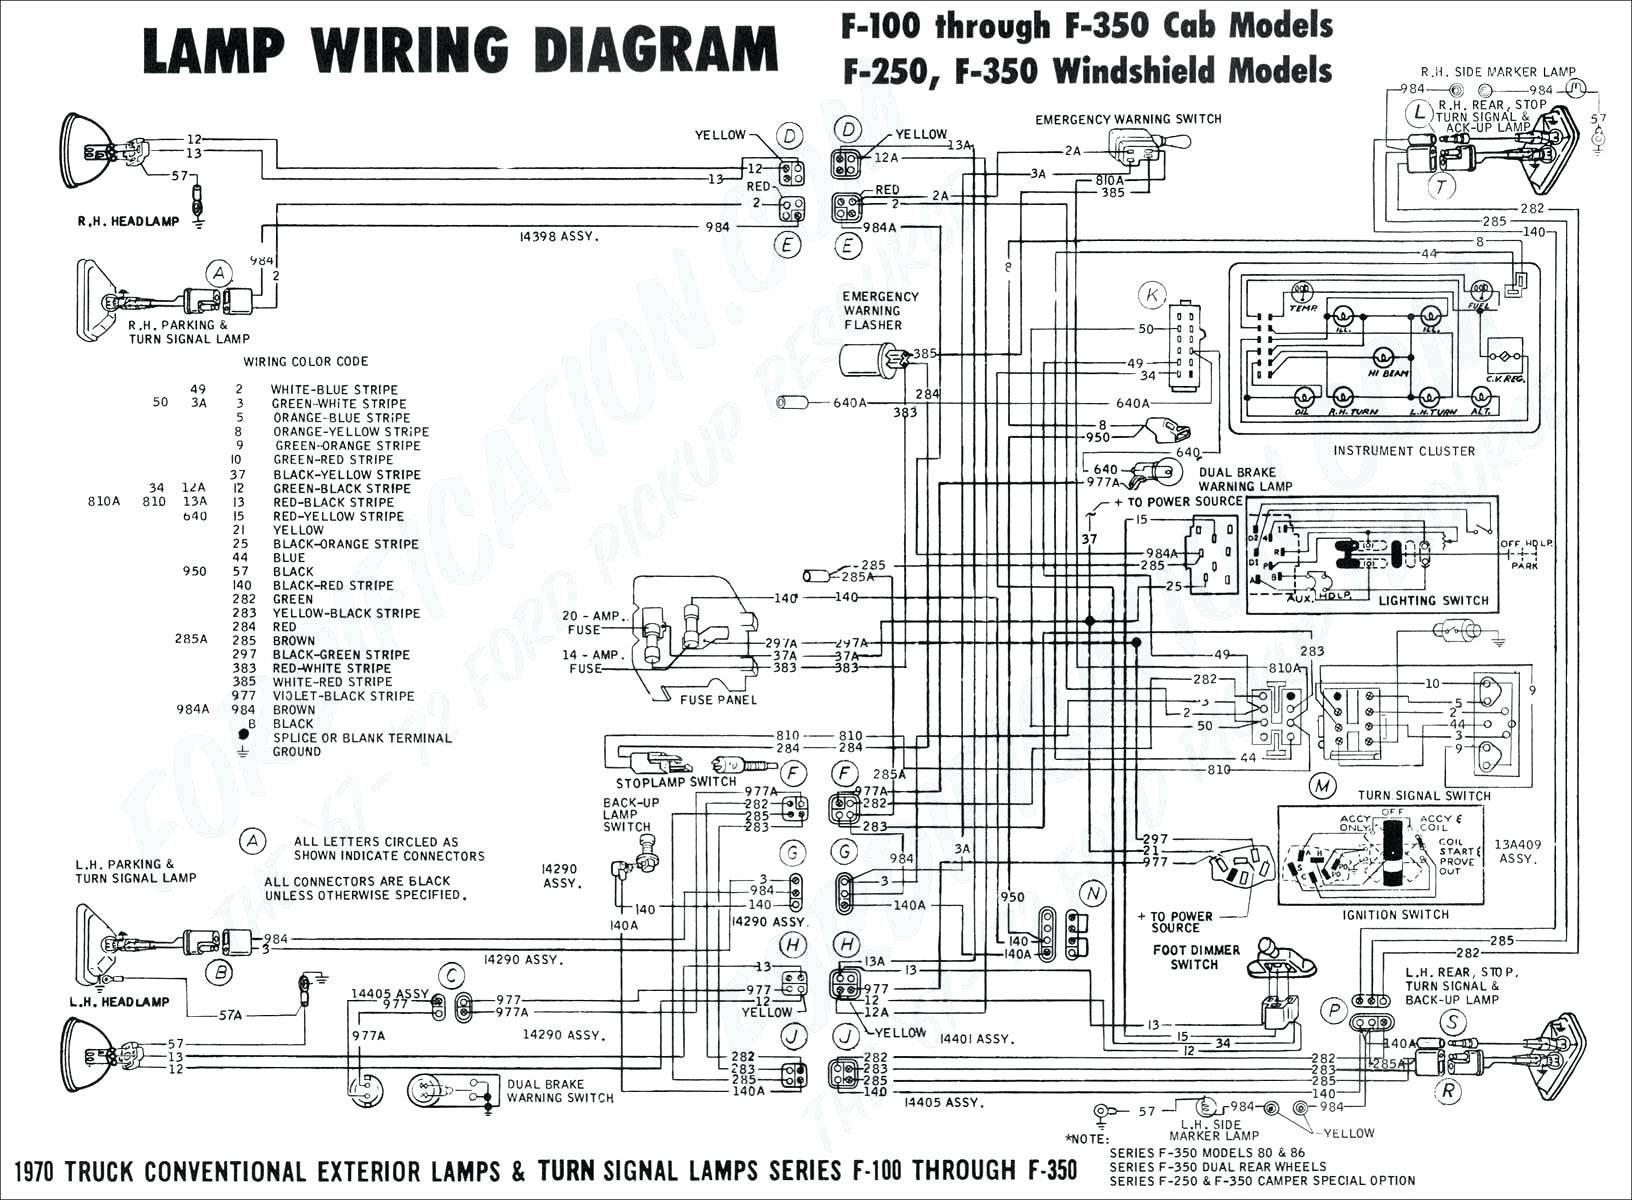 [DIAGRAM] Dodge Ram 1500 Tail Light Wiring Diagram FULL